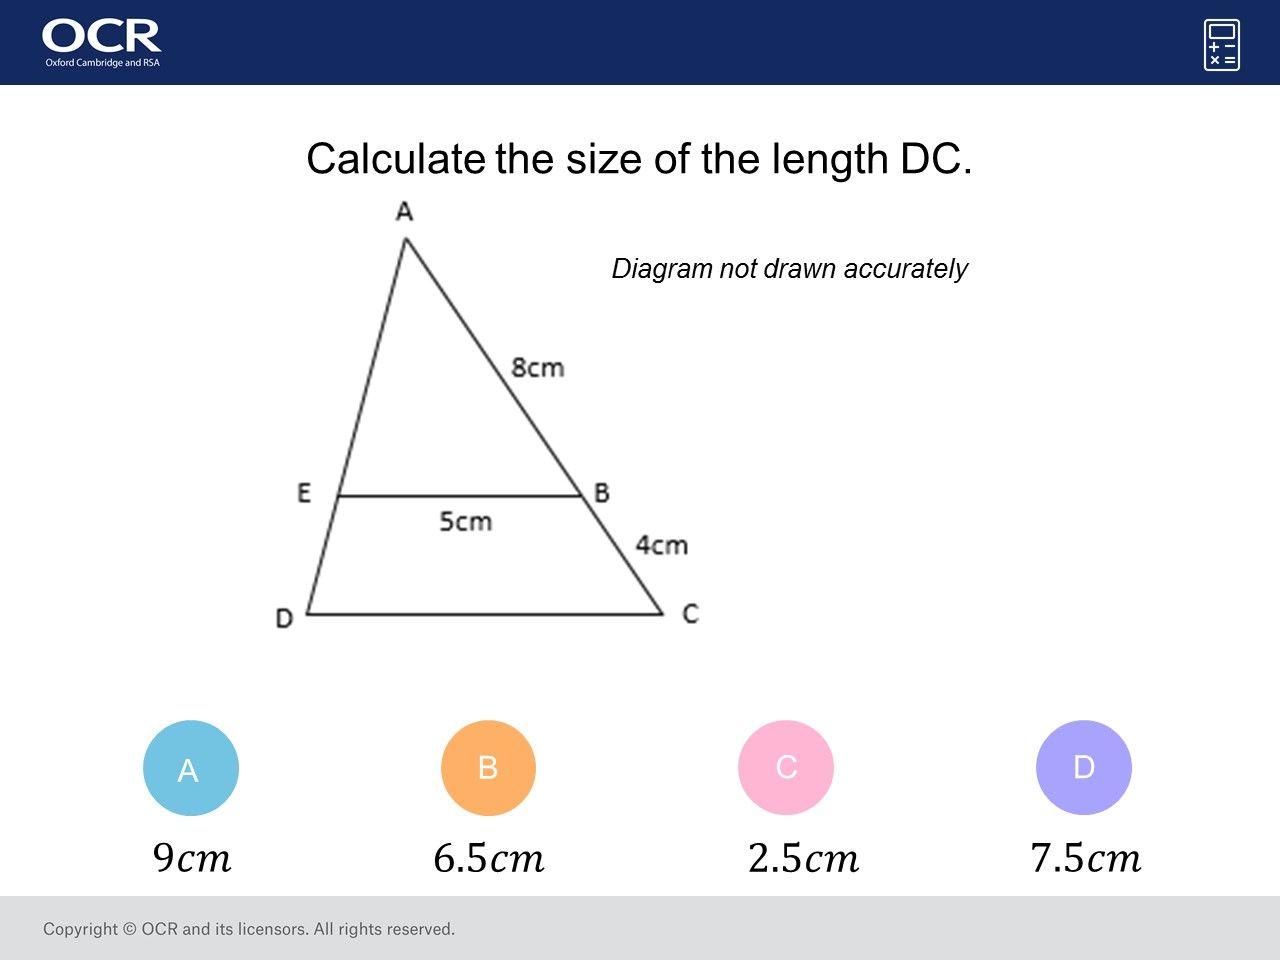 Similar Shapes Foundation Higher Gcse Maths Question Of The Week On Mr Barton Maths Gcse Math Gcse Maths Questions Gcse Questions [ 960 x 1280 Pixel ]